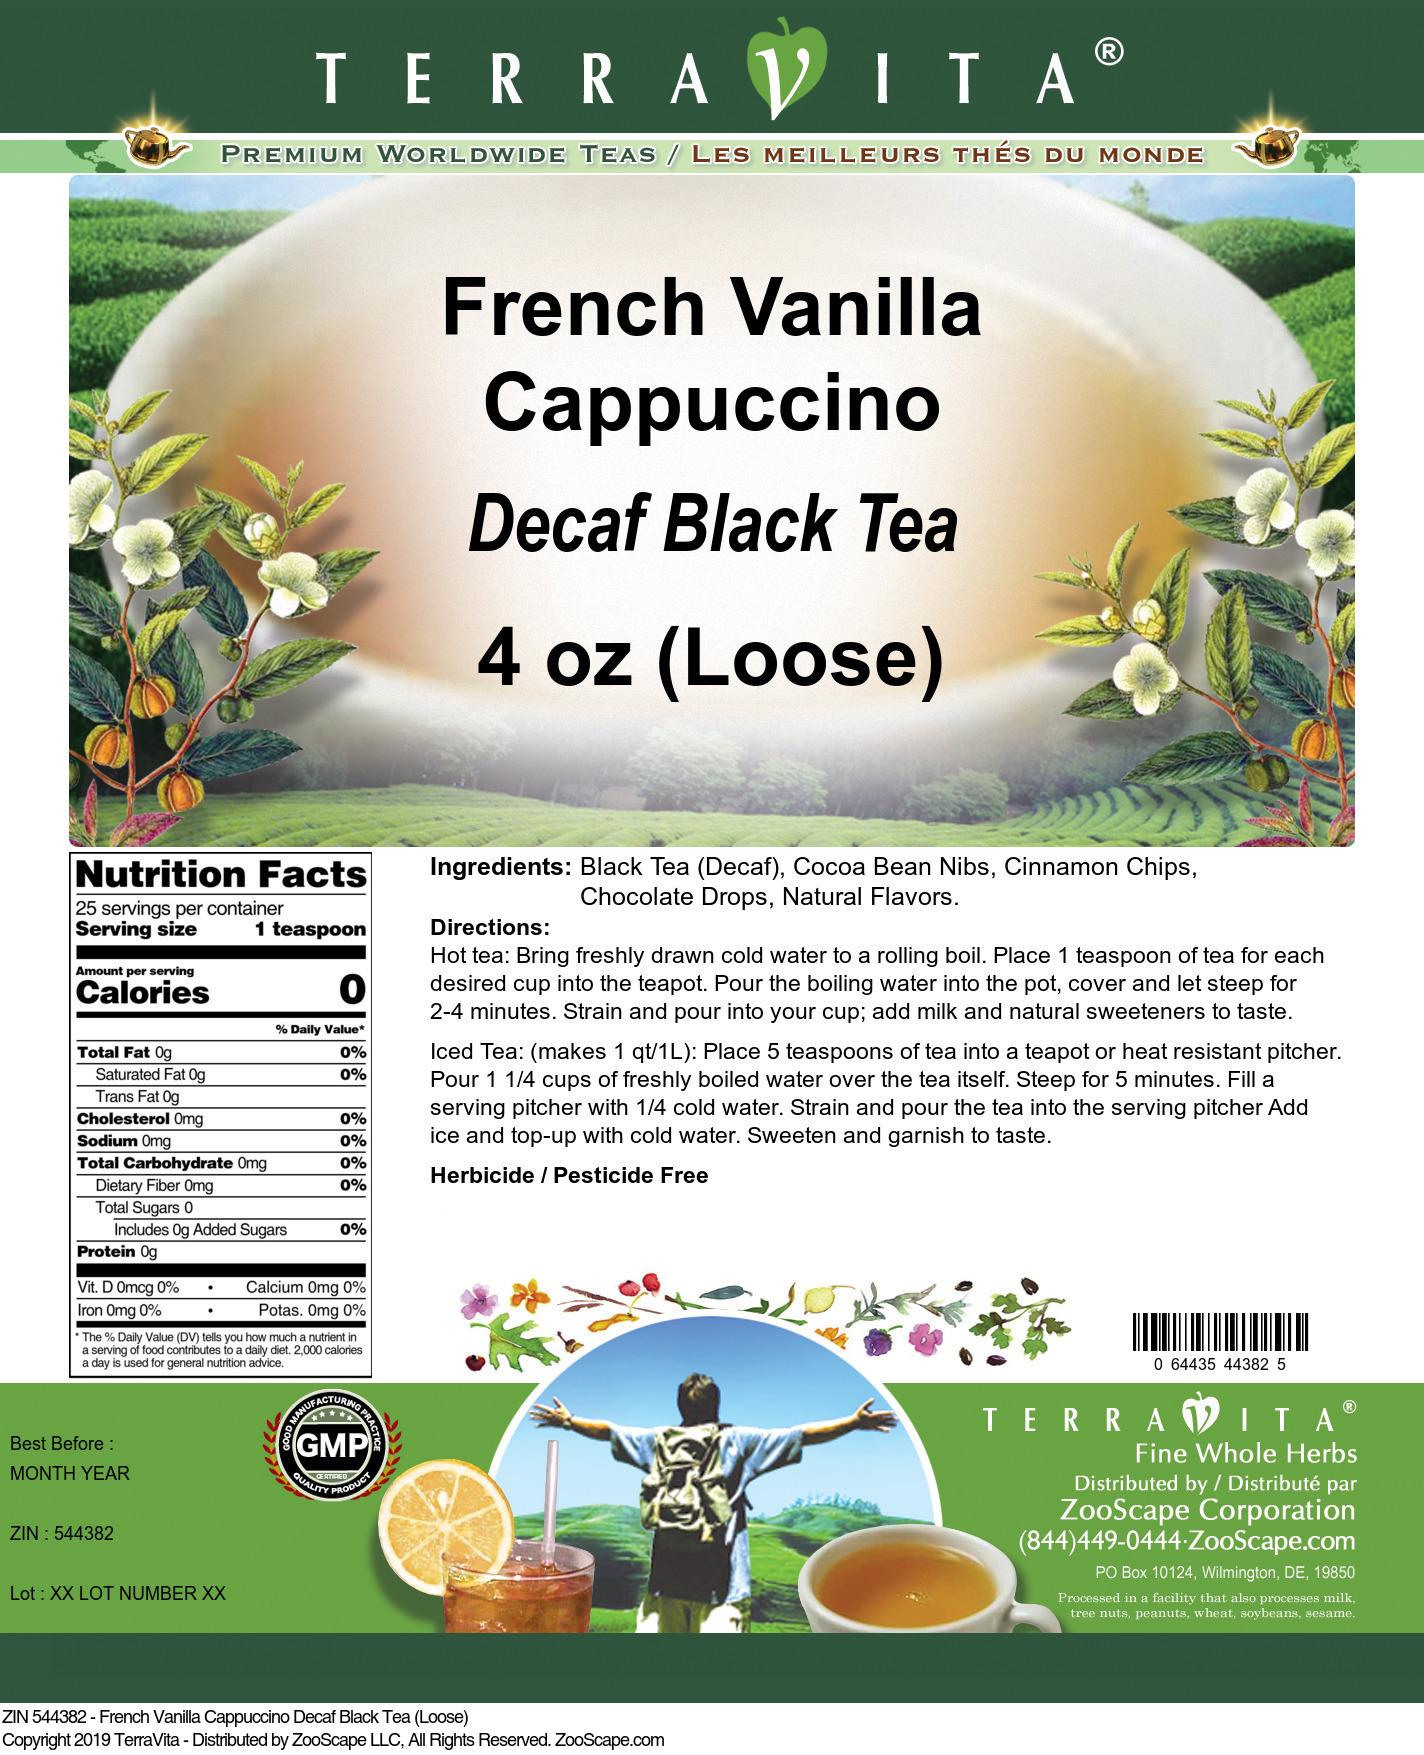 French Vanilla Cappuccino Decaf Black Tea